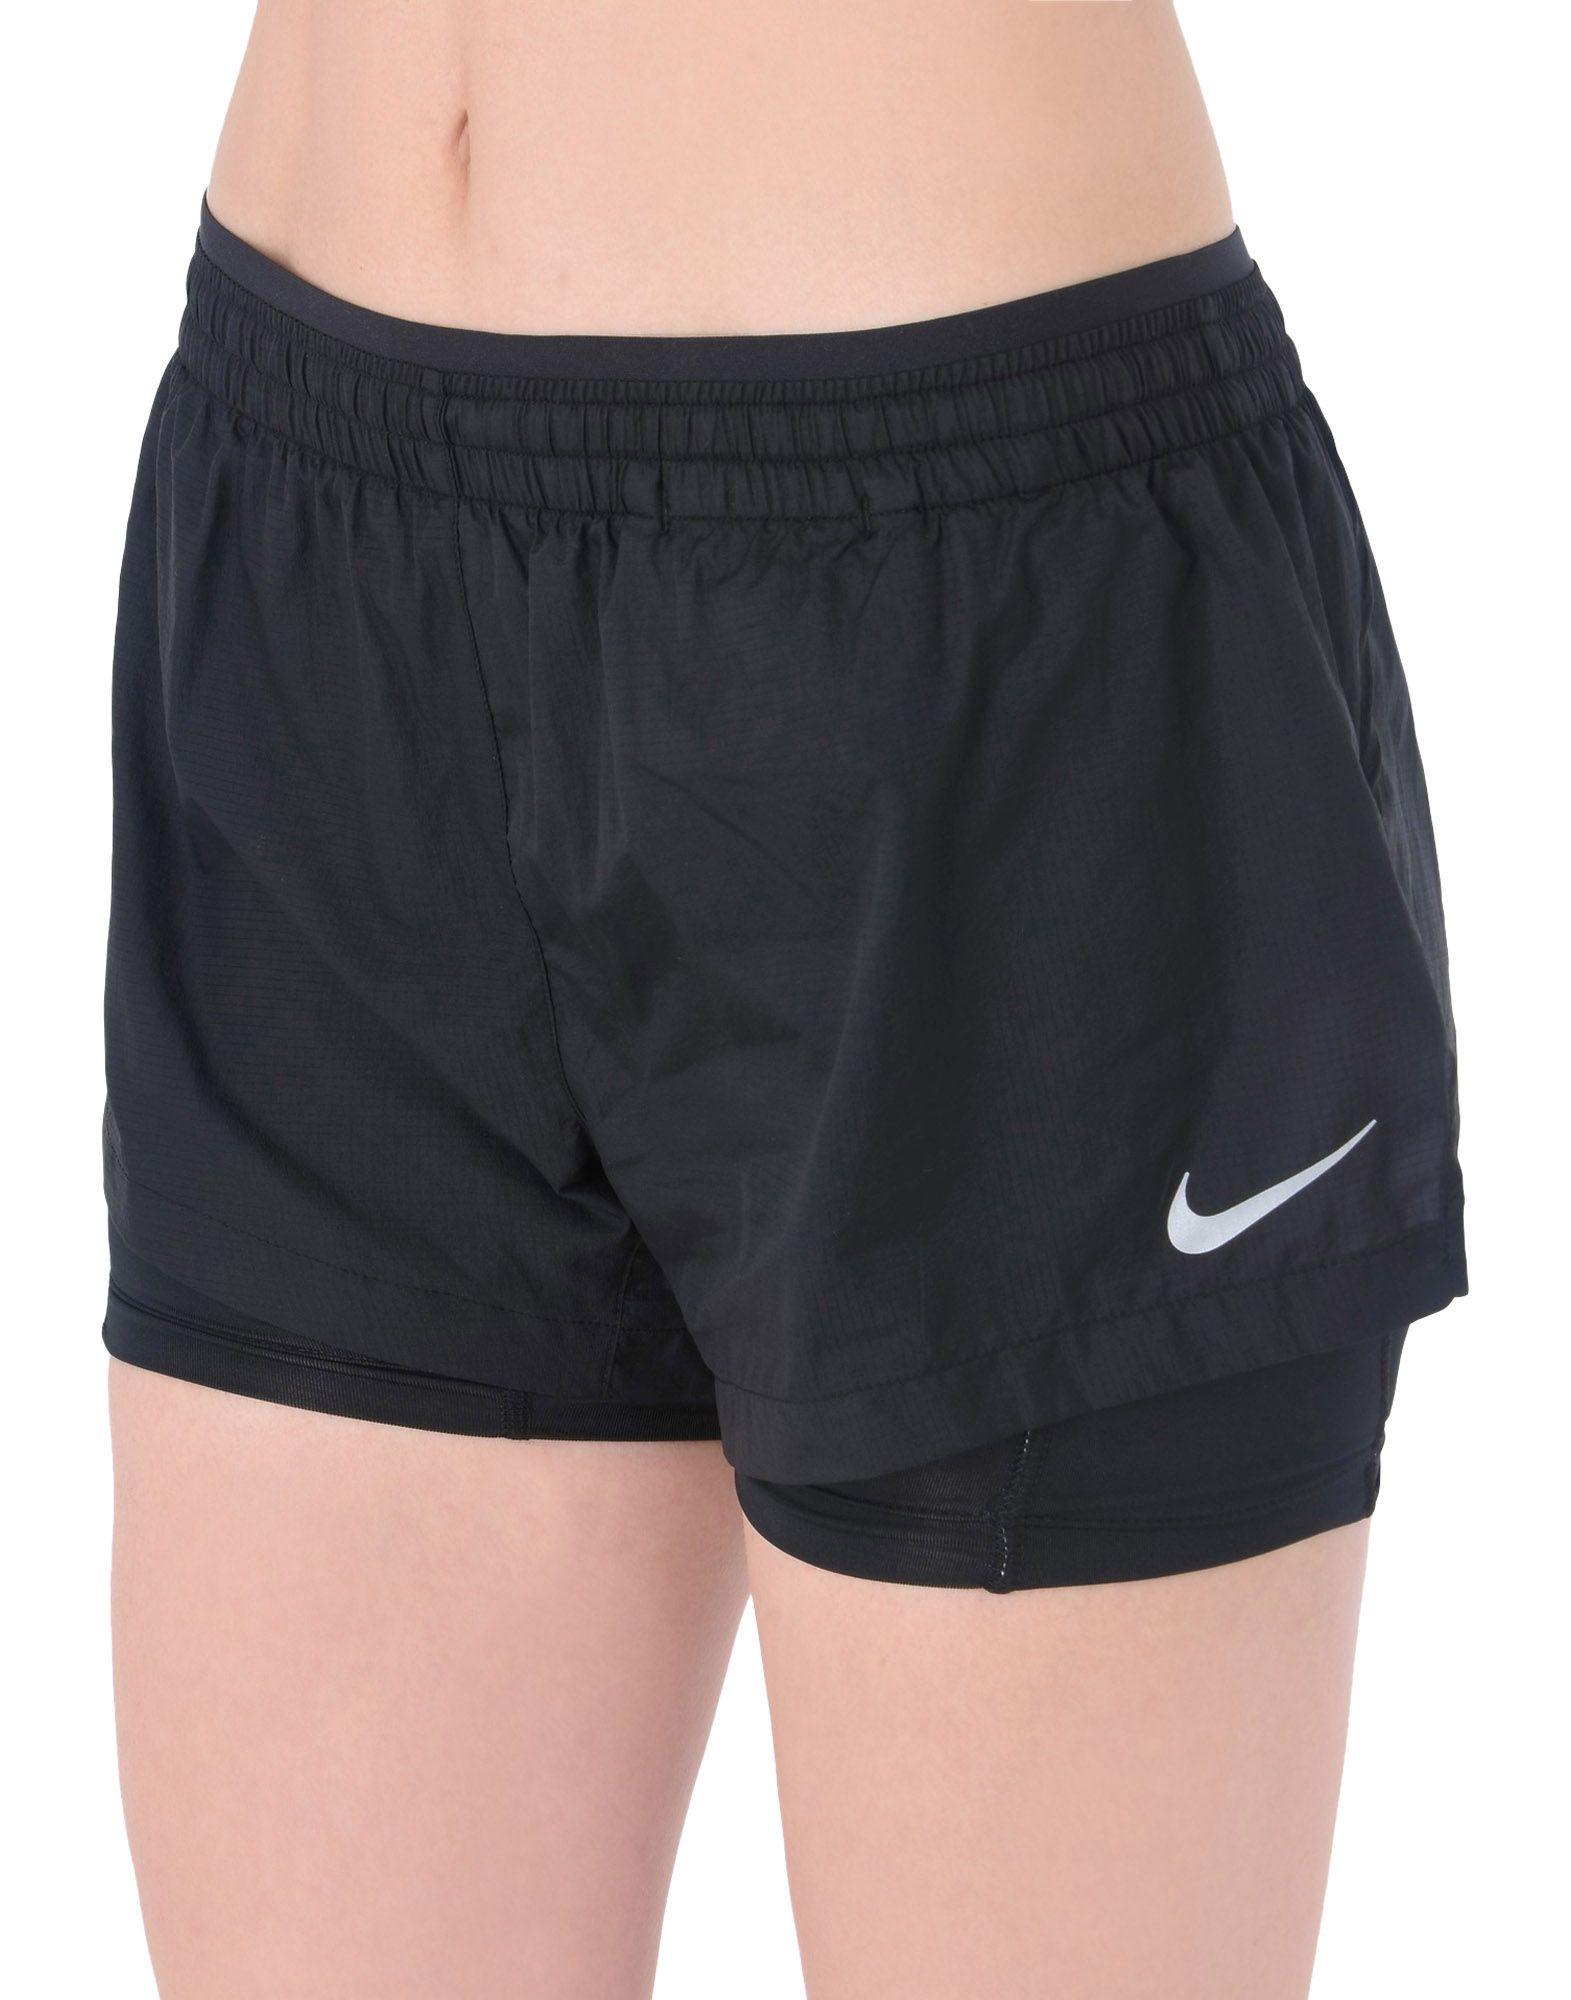 NIKE Повседневные шорты original new arrival nike roshe one hyp br men s running shoes low top sneakers